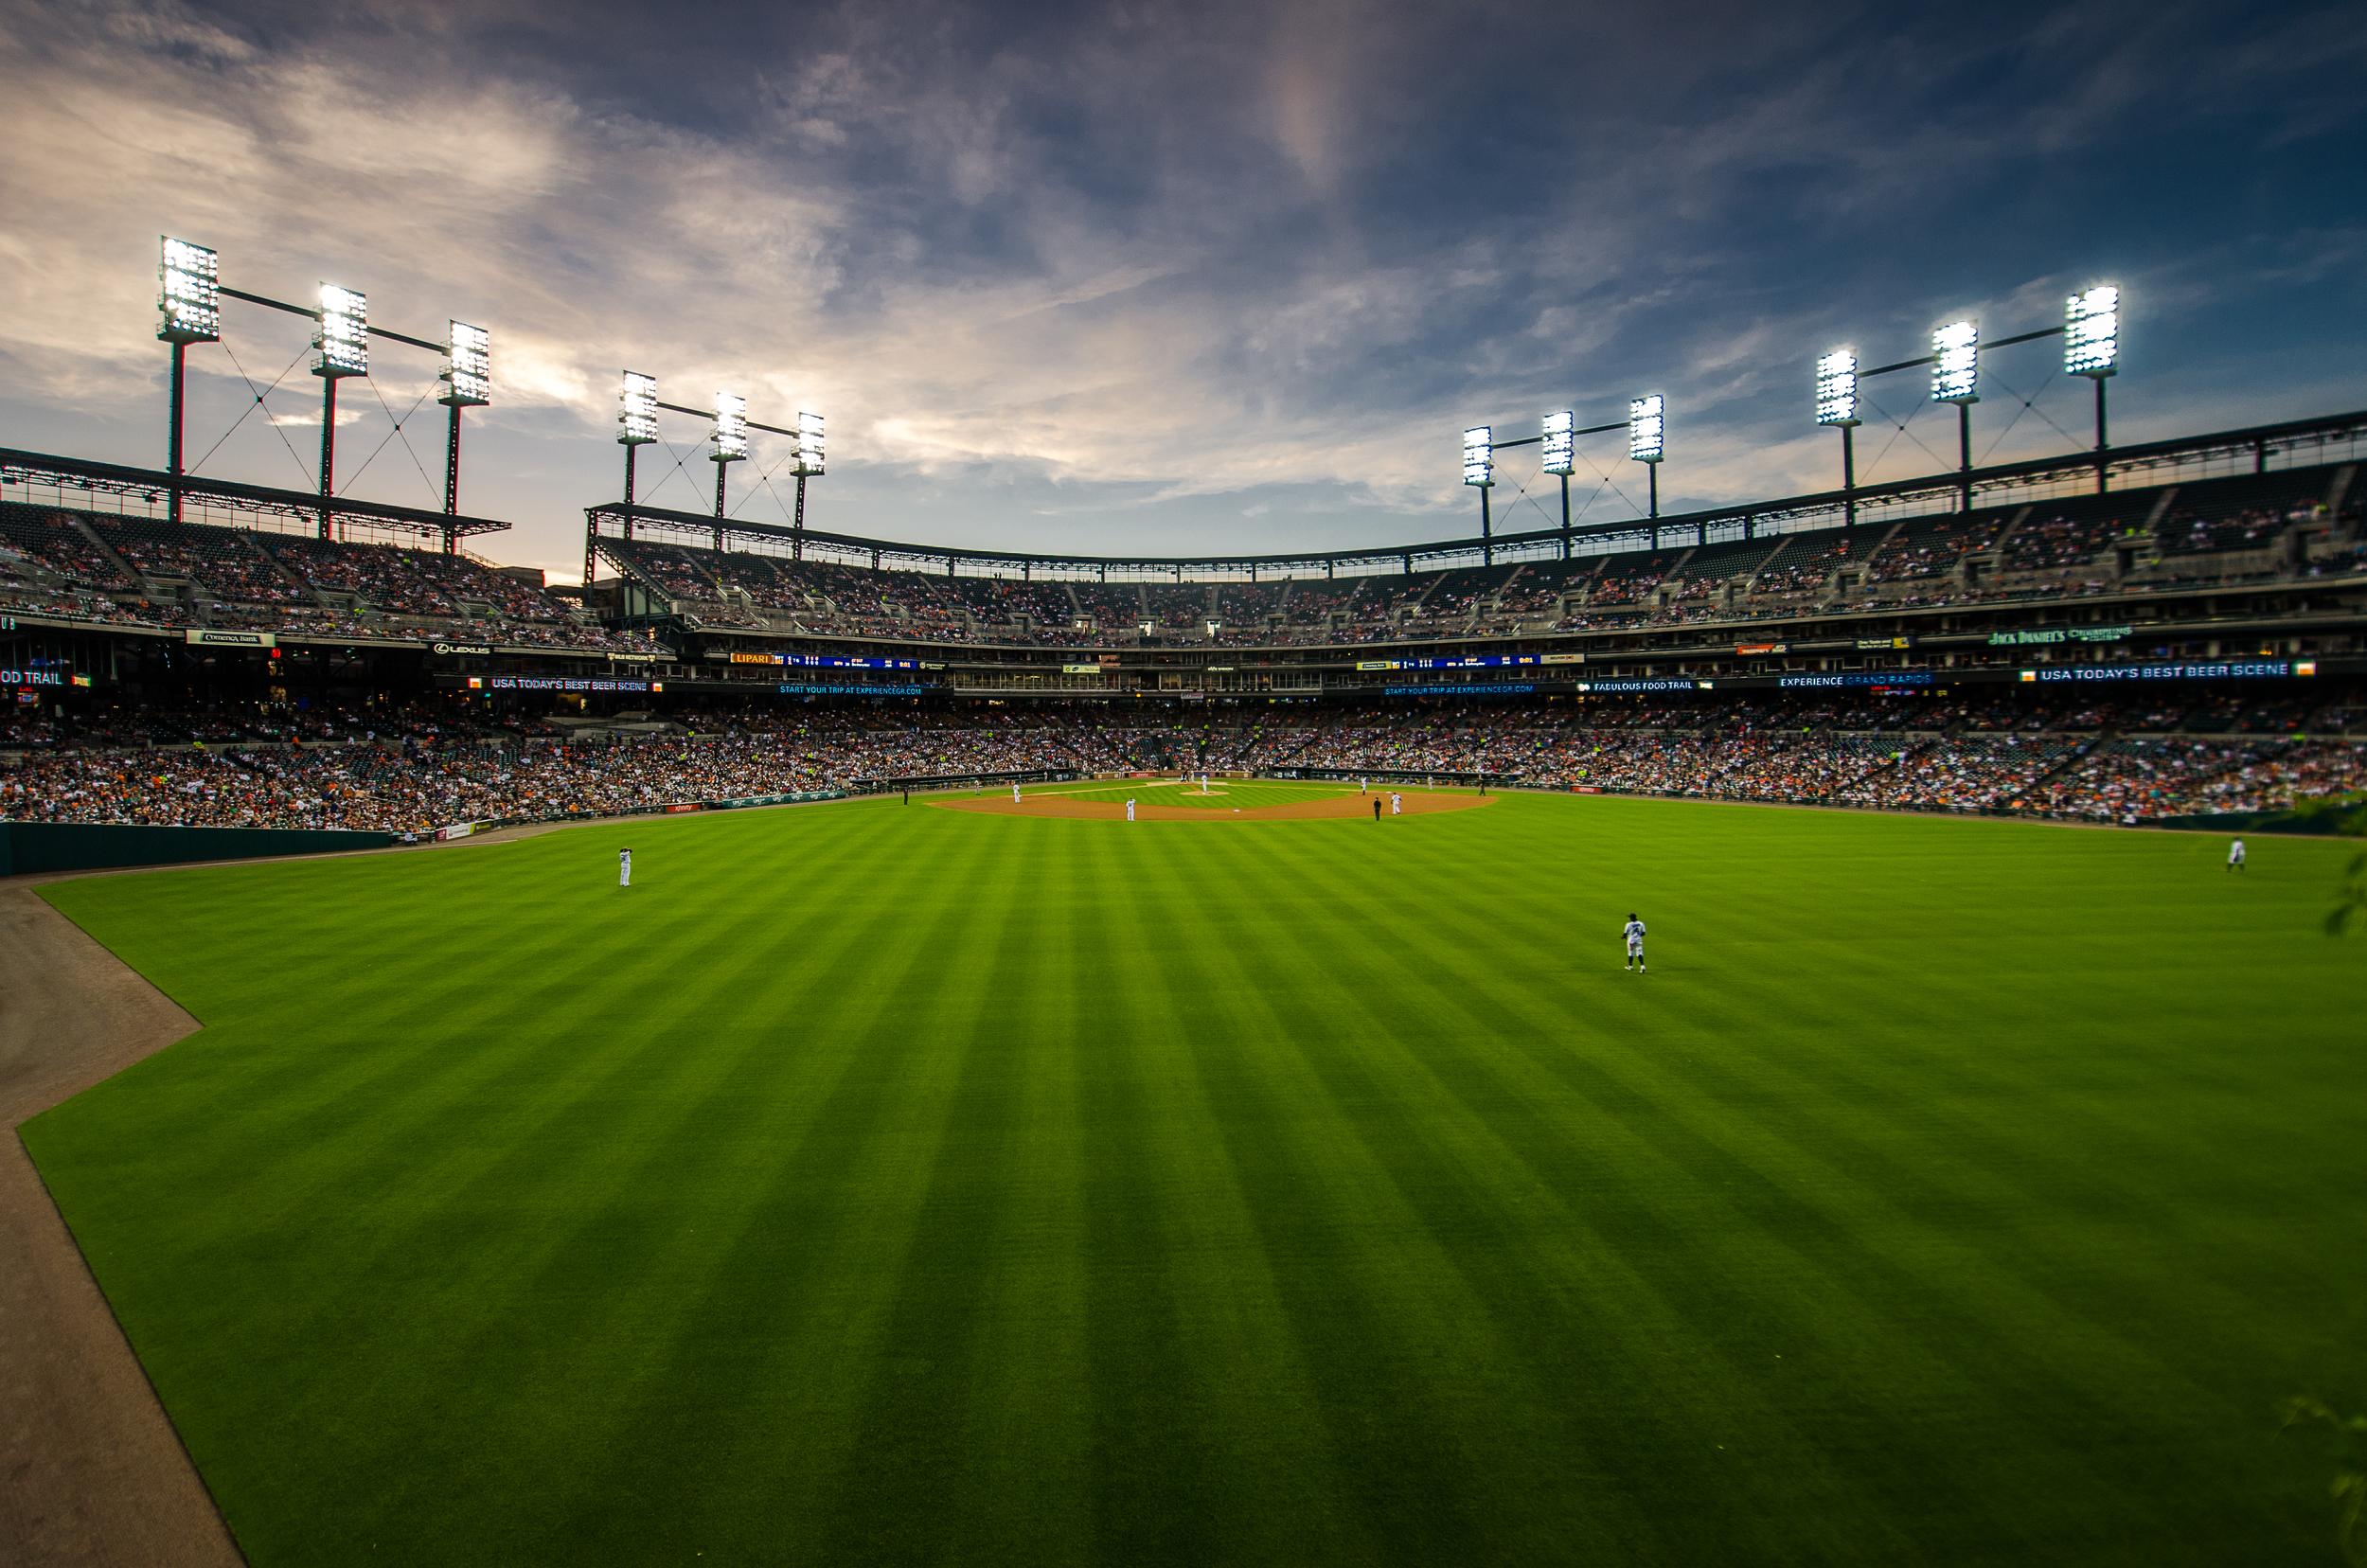 Comerica Park Center Field